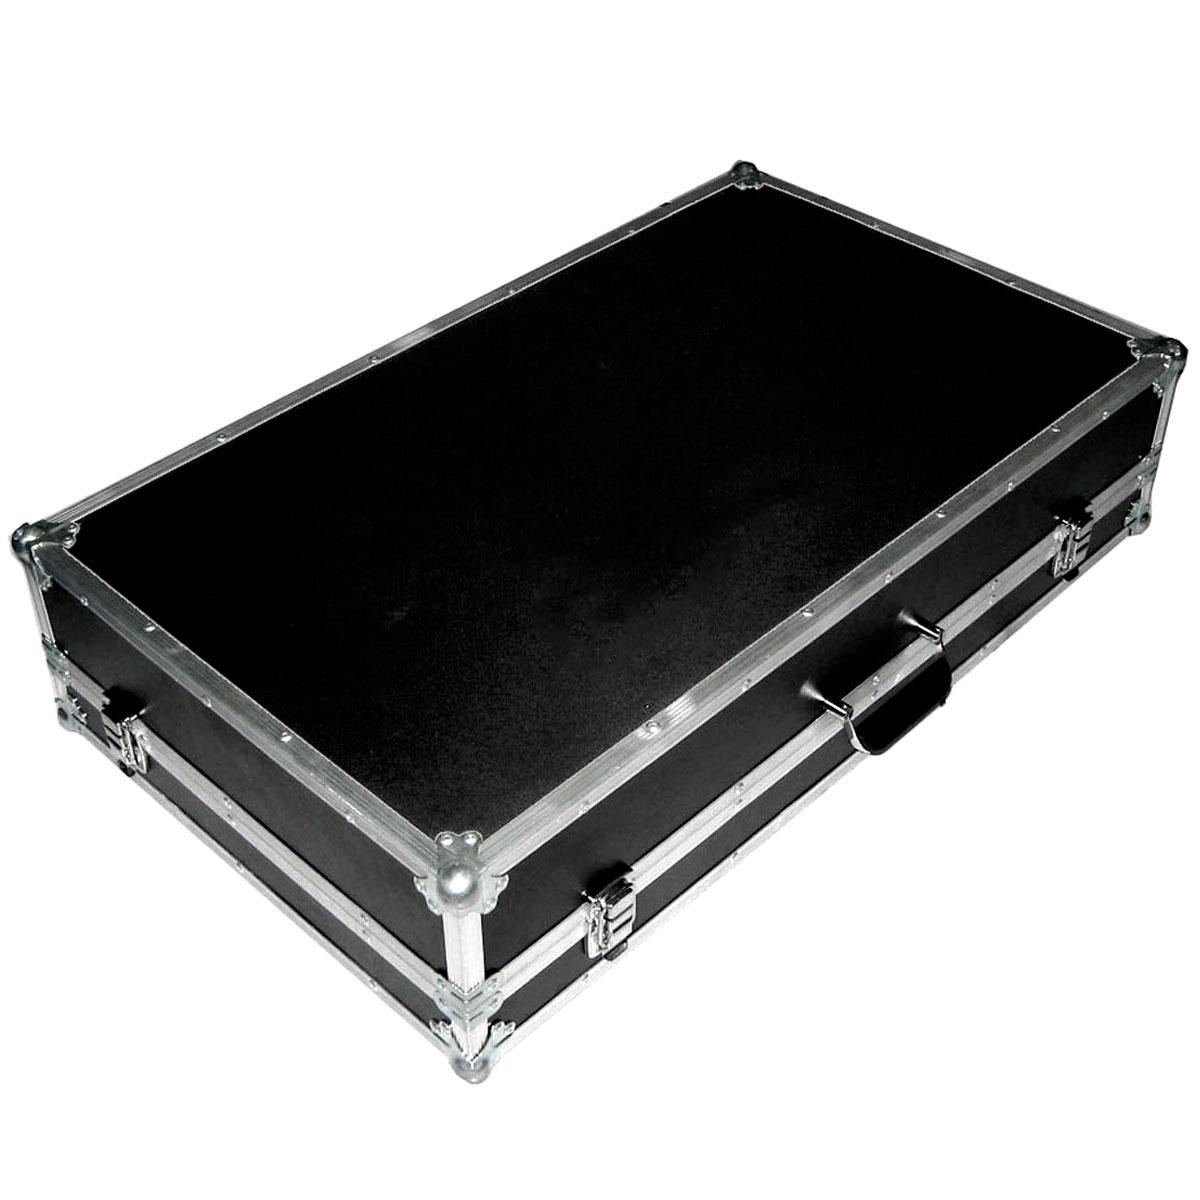 Case p/ 2 CDJ 350 + 1 Mixer + Fone c/ Tampa Removível